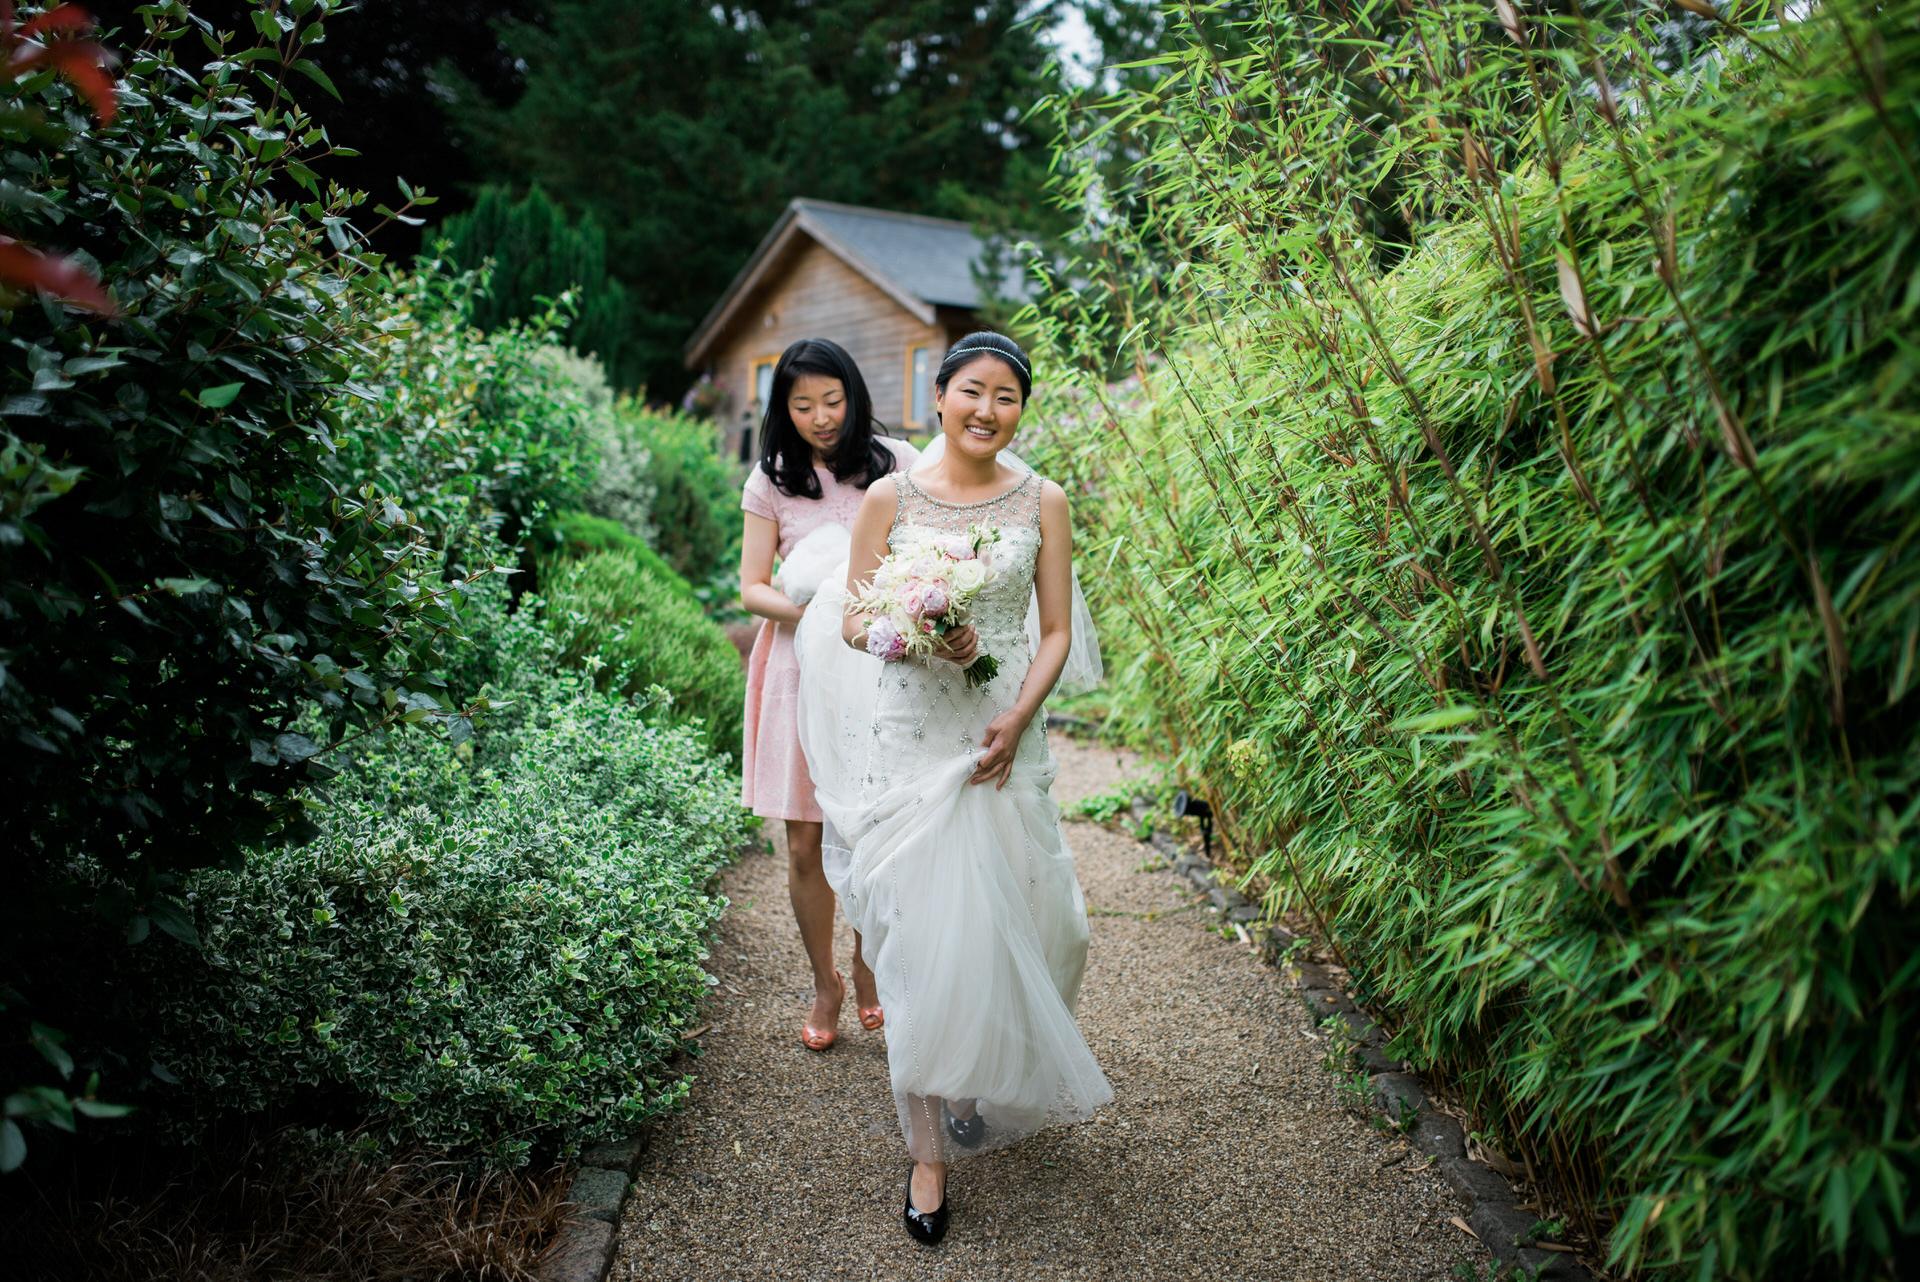 Charlton House wedding photographer